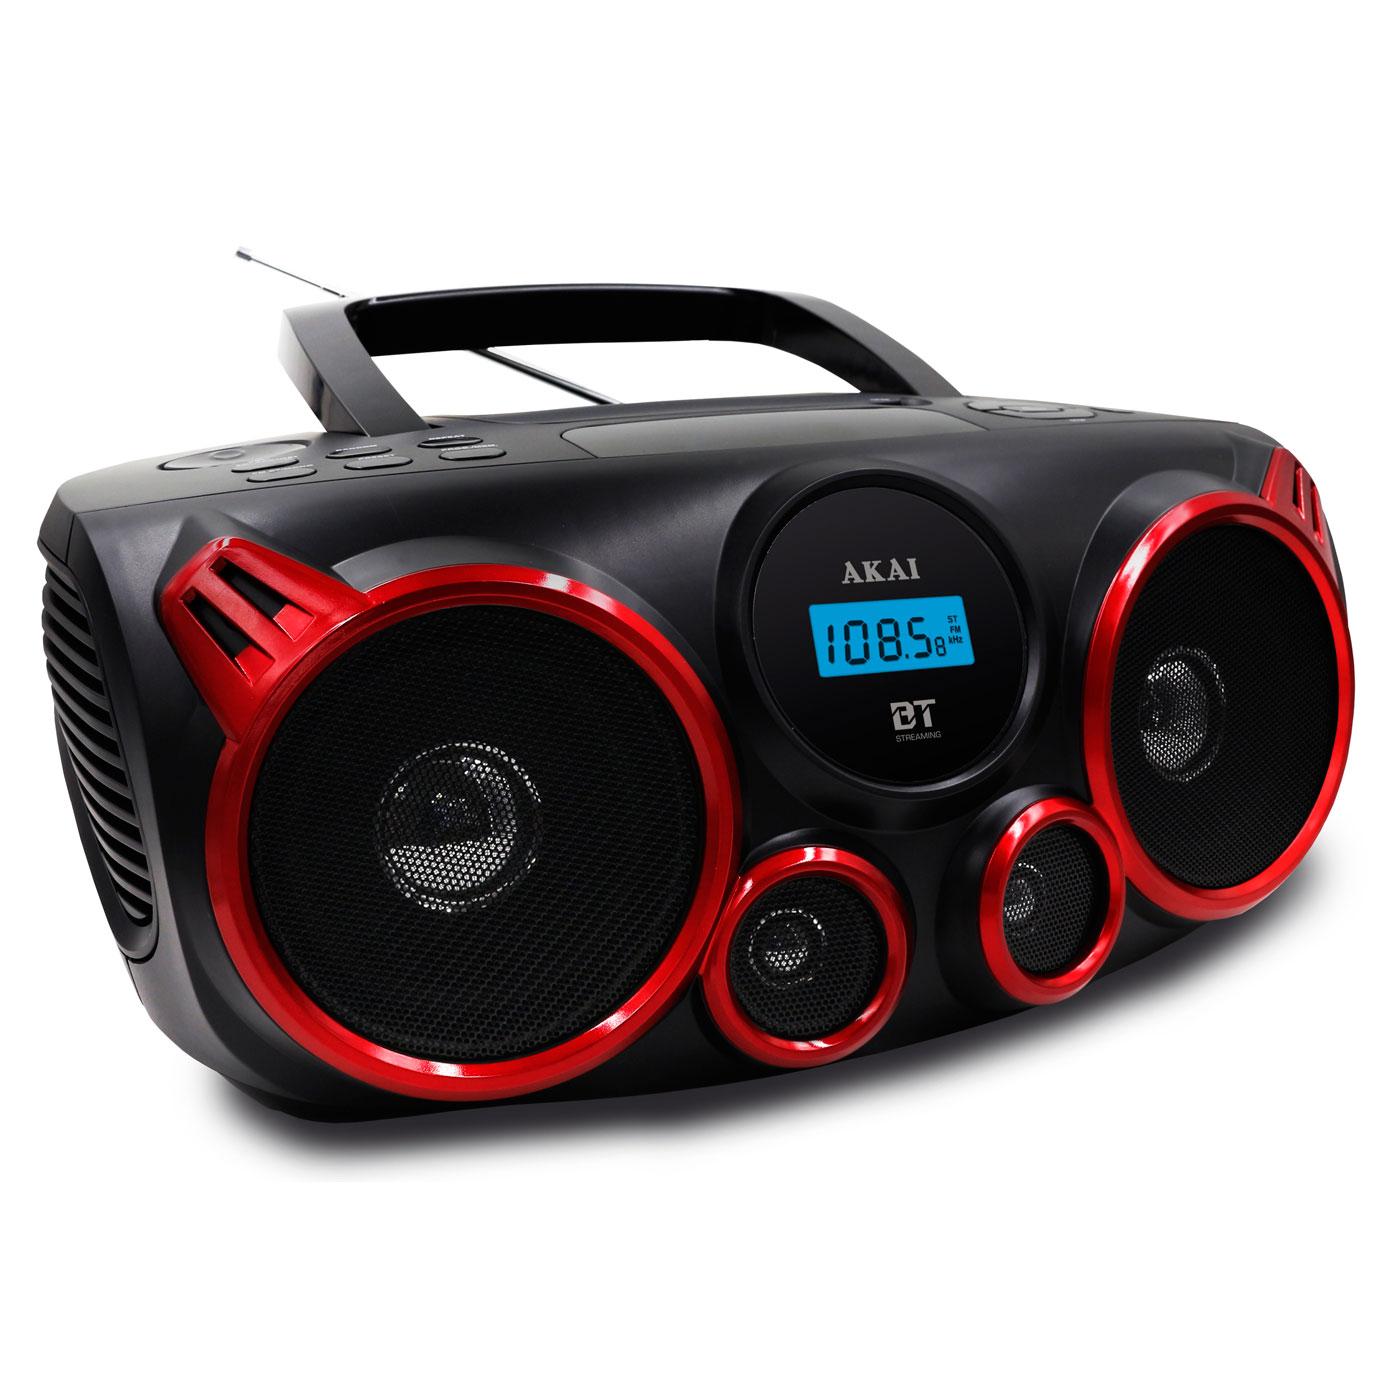 akai ceu 2700bt boombox radio radio r veil aka sur. Black Bedroom Furniture Sets. Home Design Ideas